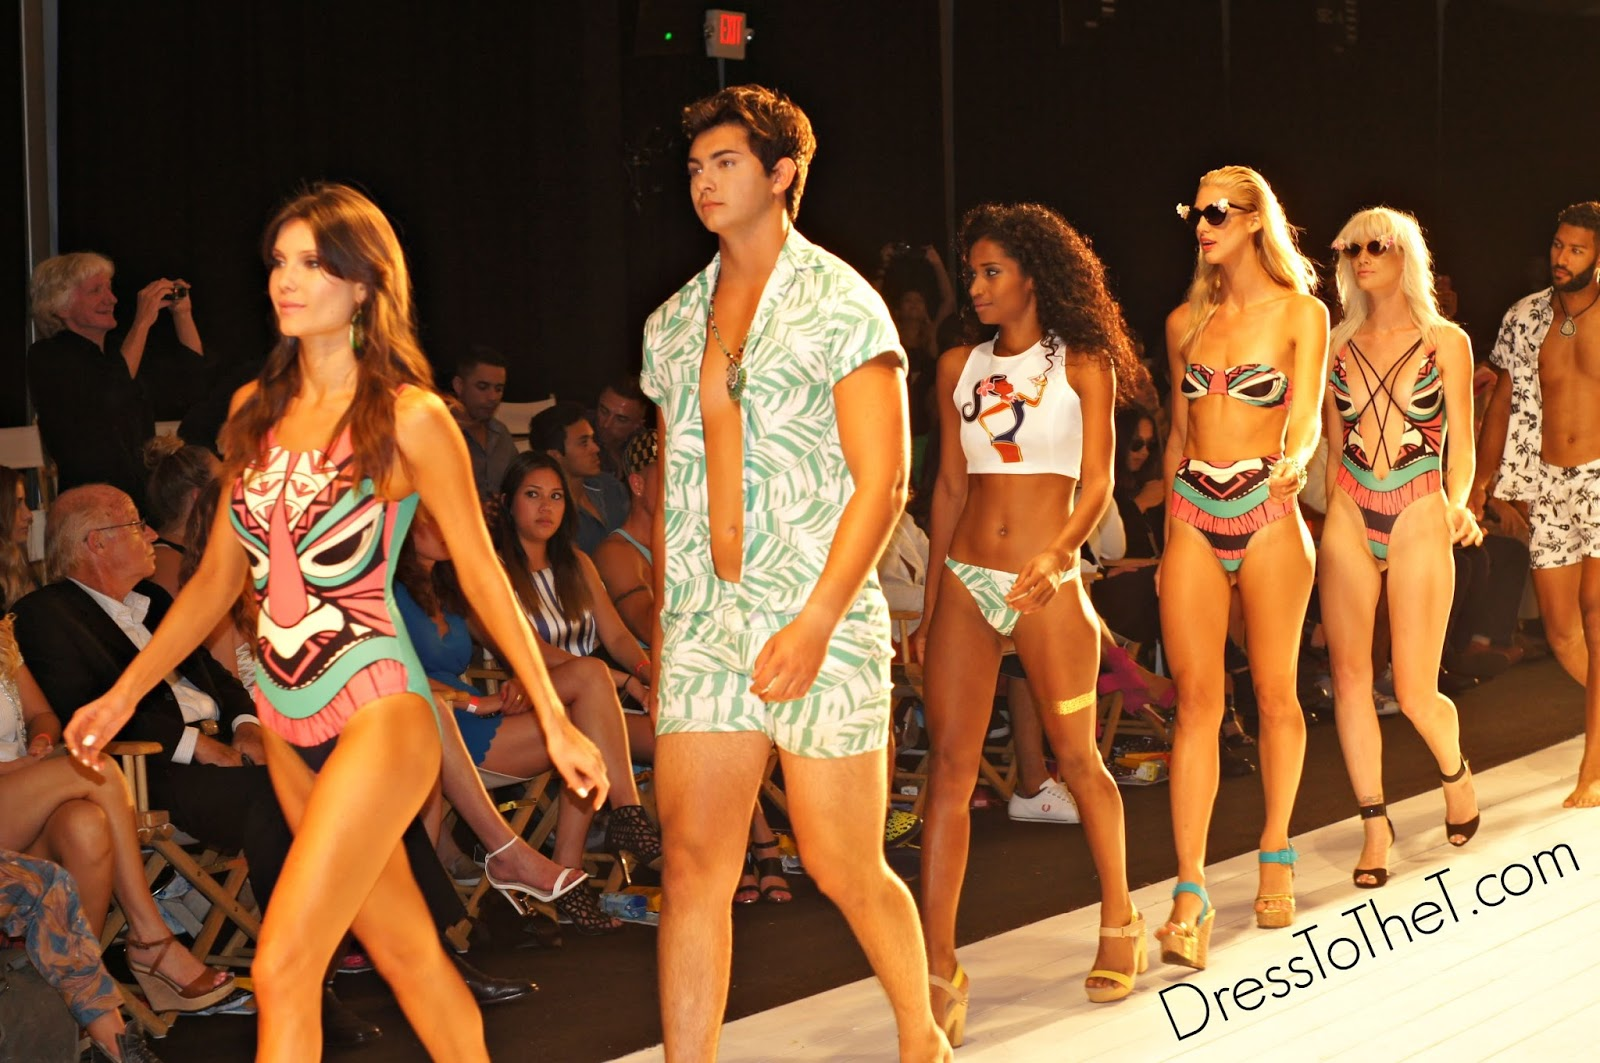 8fcb7345b4 ... Ca-Rio-Ca Wear, Just Bones Boardwear, & Koco Blaq, Funkshion's Acacia  show & the Swim Miami Runway Astralia show featuring Jewels + Grace and  Allerton ...